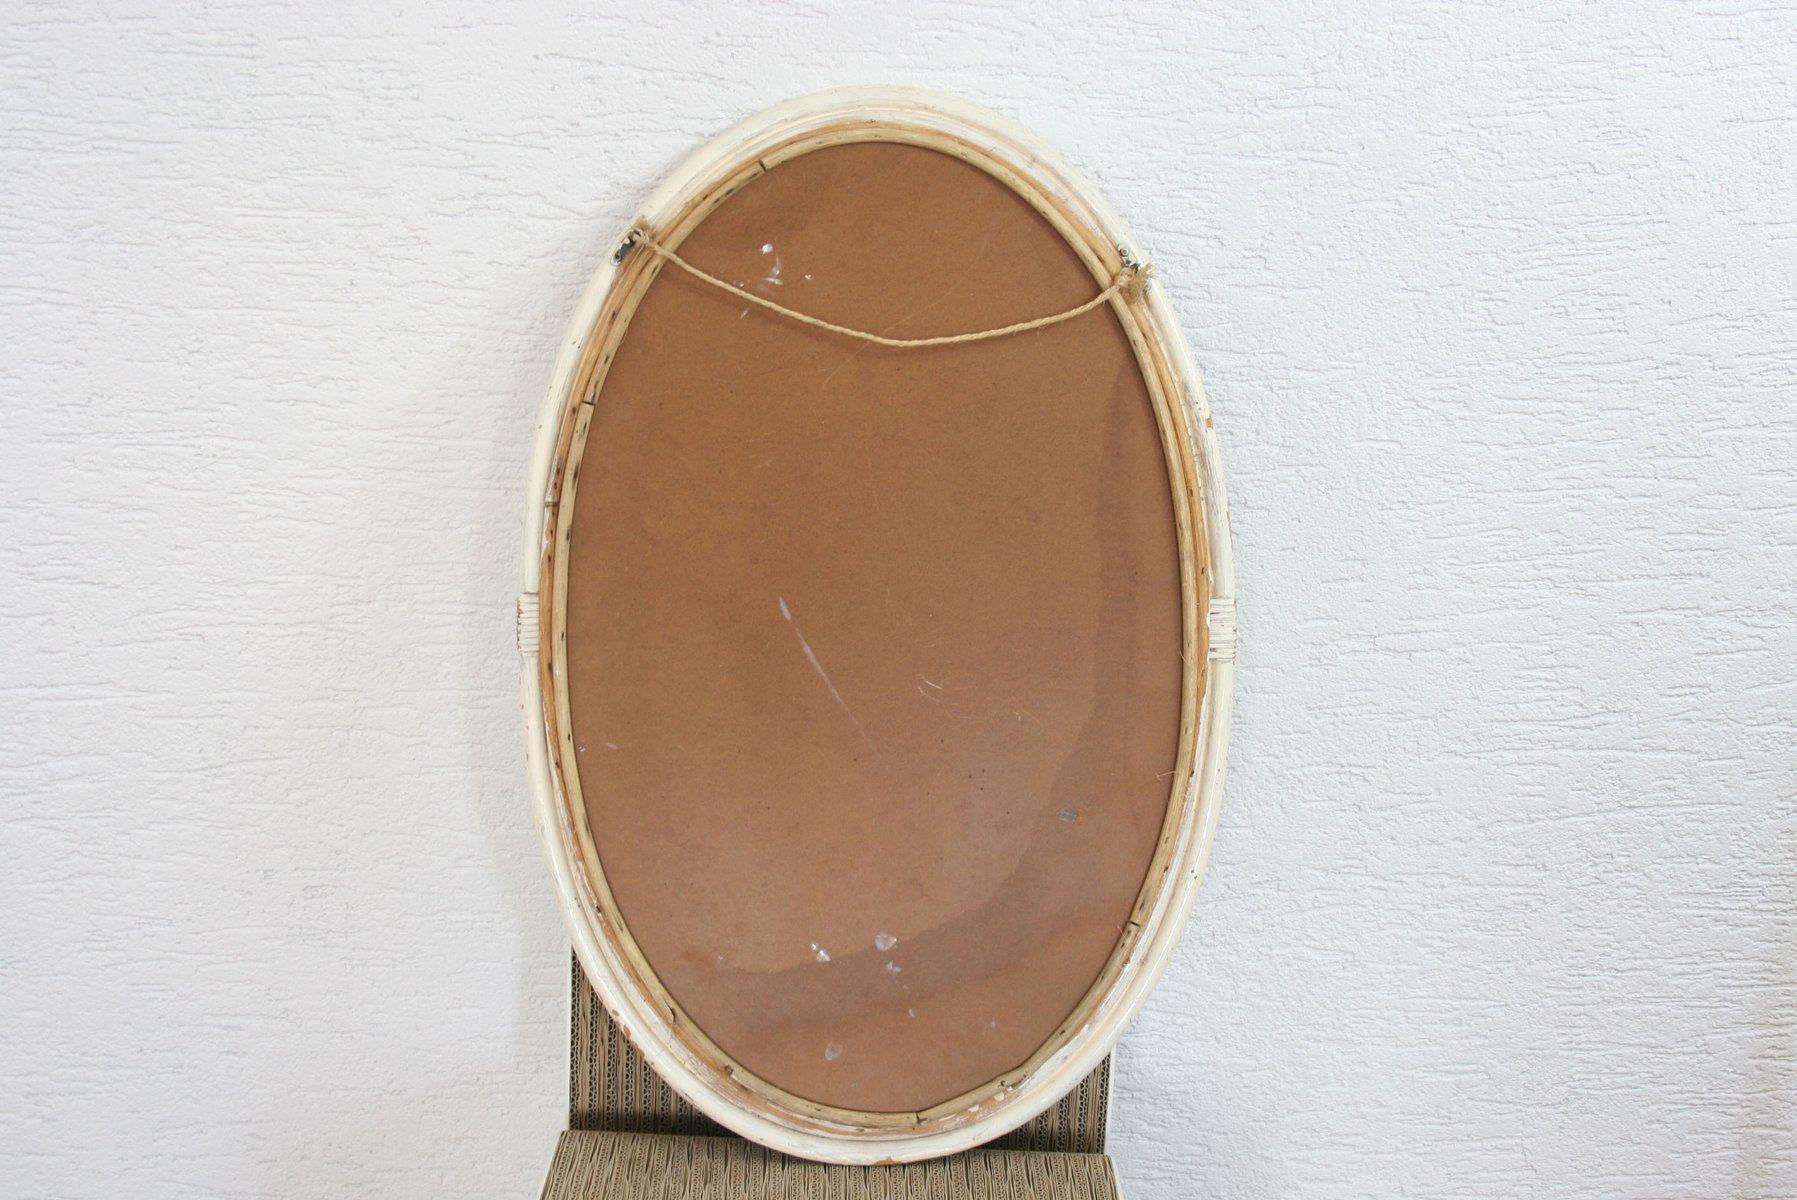 gro er vintage spiegel in sonnen optik mit rattan rahmen. Black Bedroom Furniture Sets. Home Design Ideas